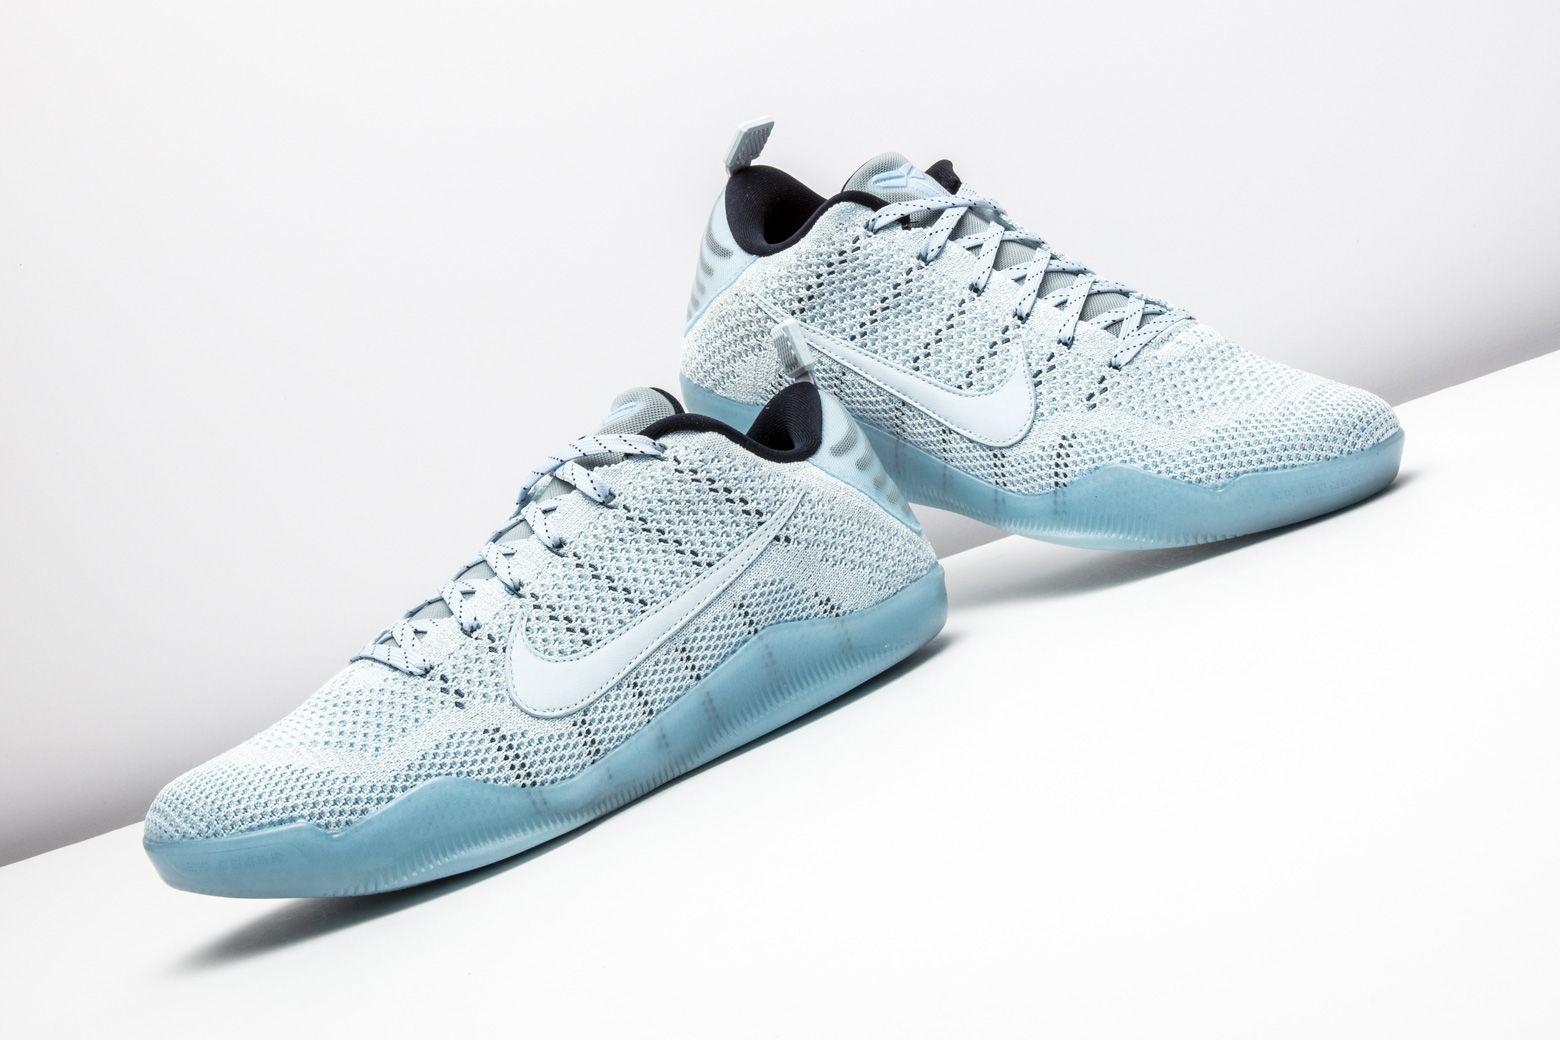 check out 1969e 17006 The Nike Kobe 11 Elite Low 4KB